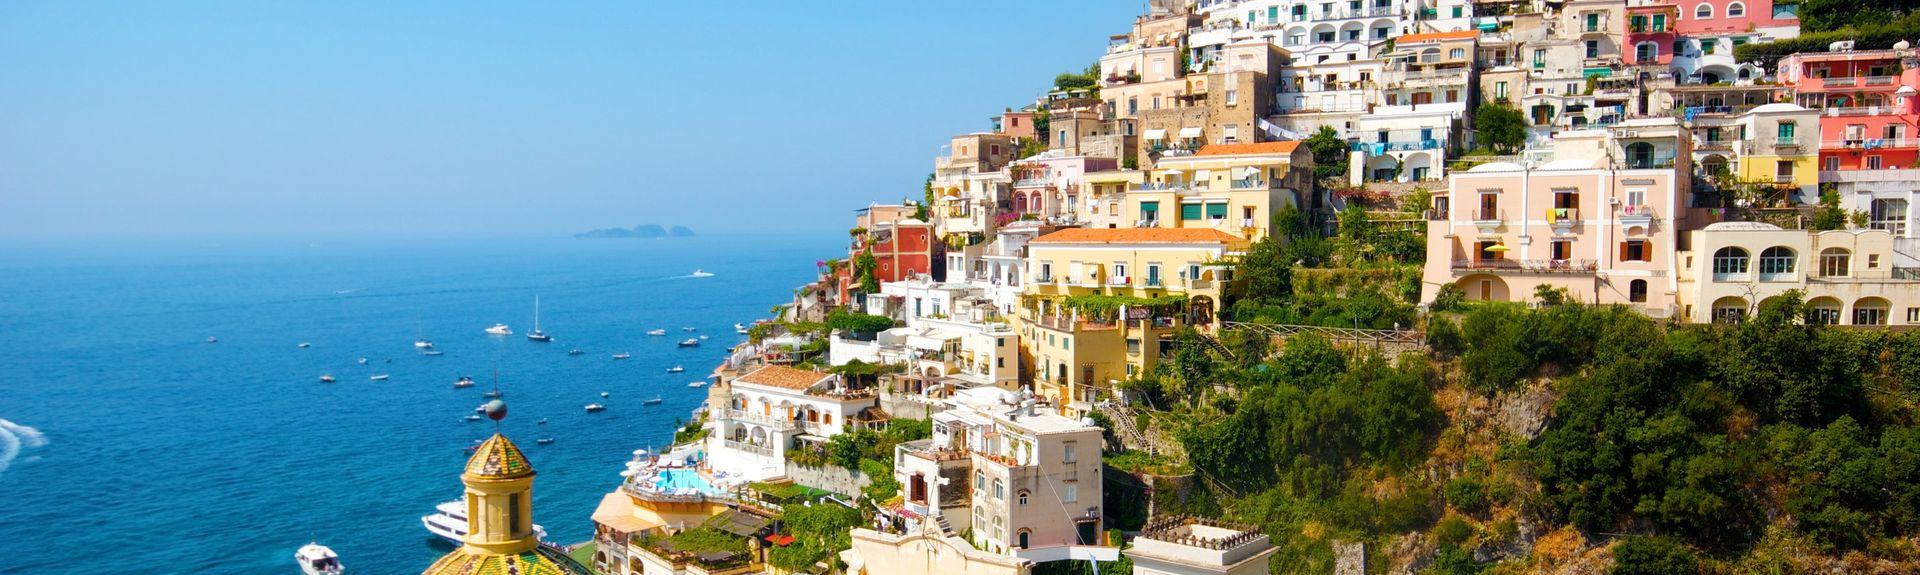 Amalfin rannikko, Campania, Italia